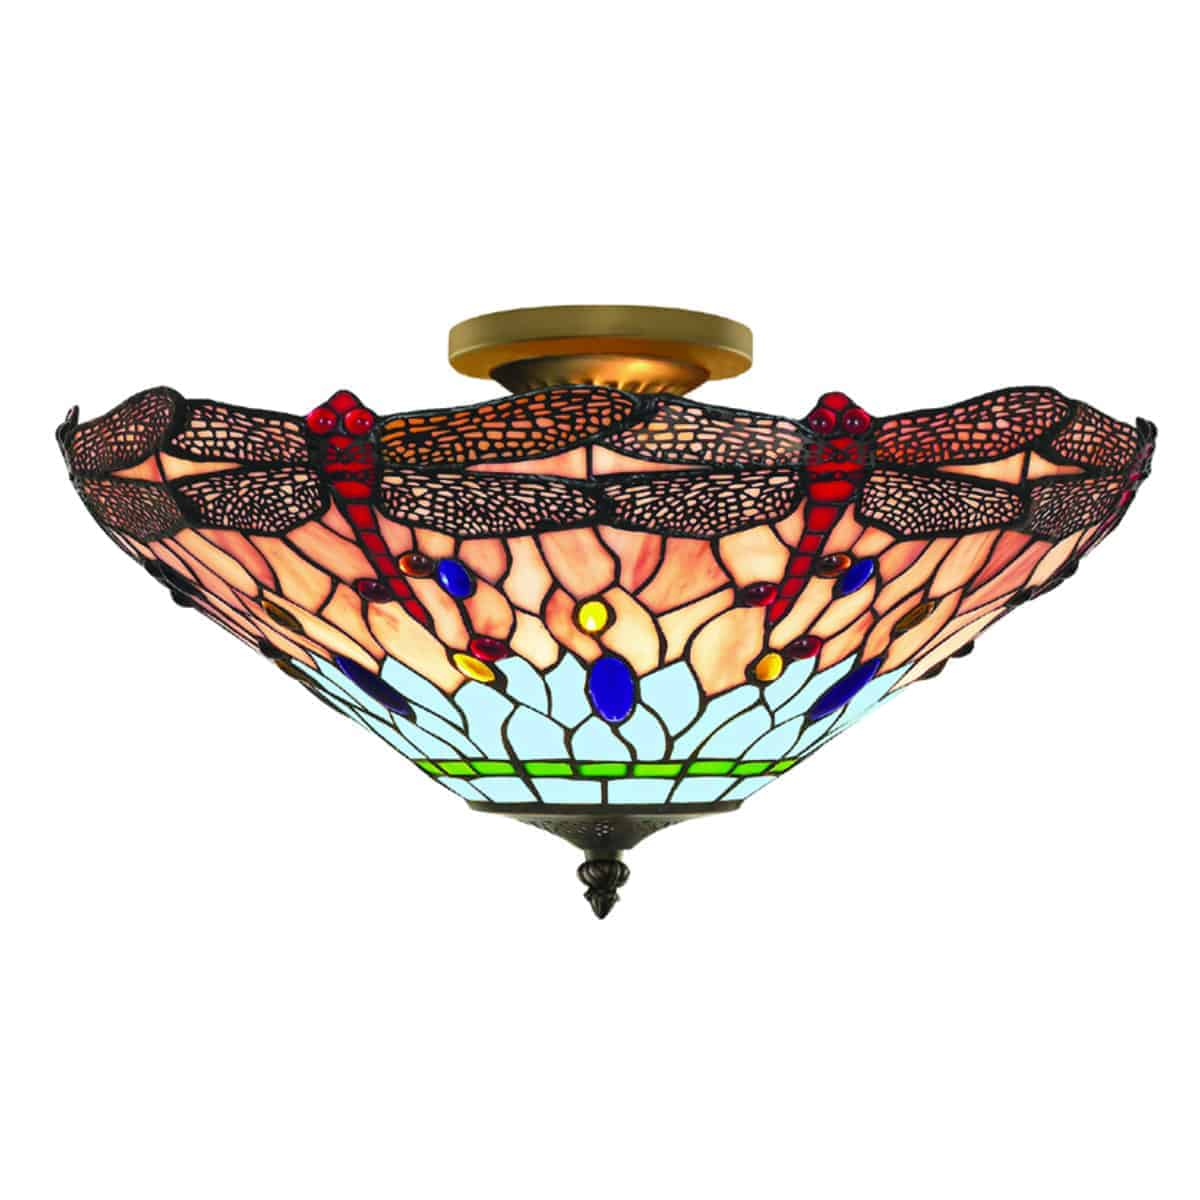 Searchlight 1289-16 Dragonfly Antique Brass 3 Light Semi-Flush with Handmade Tiffany Glass